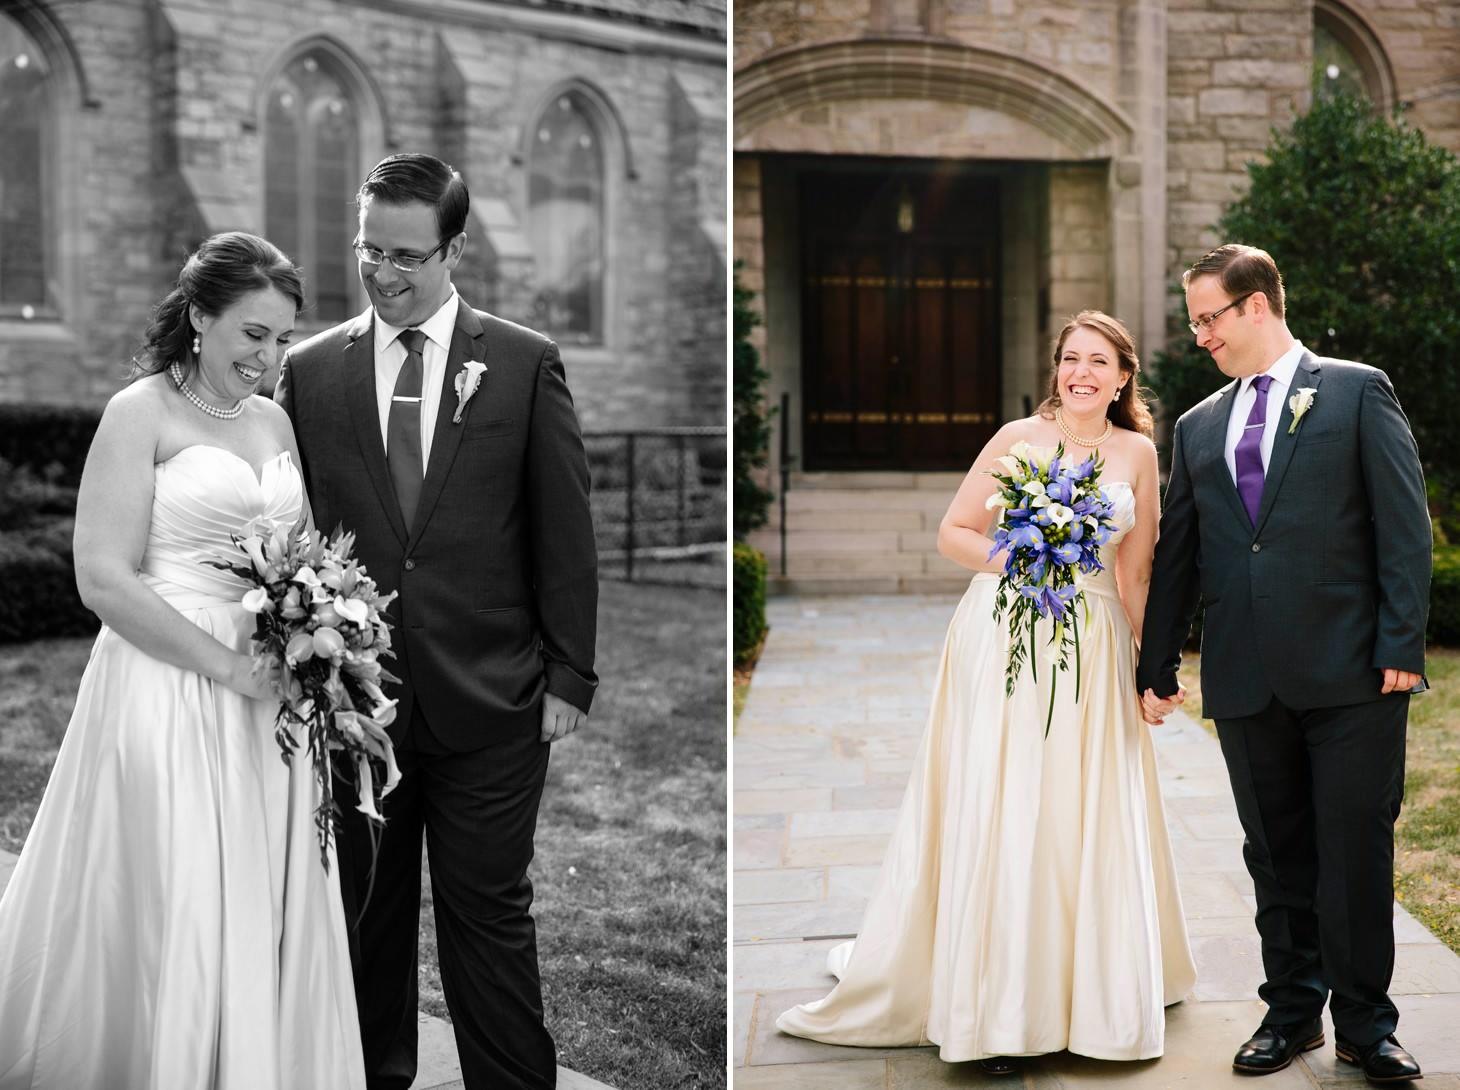 007-nyc-wedding-photographer-hoboken-waterfront-wedding-photos-smitten-chickens.jpg